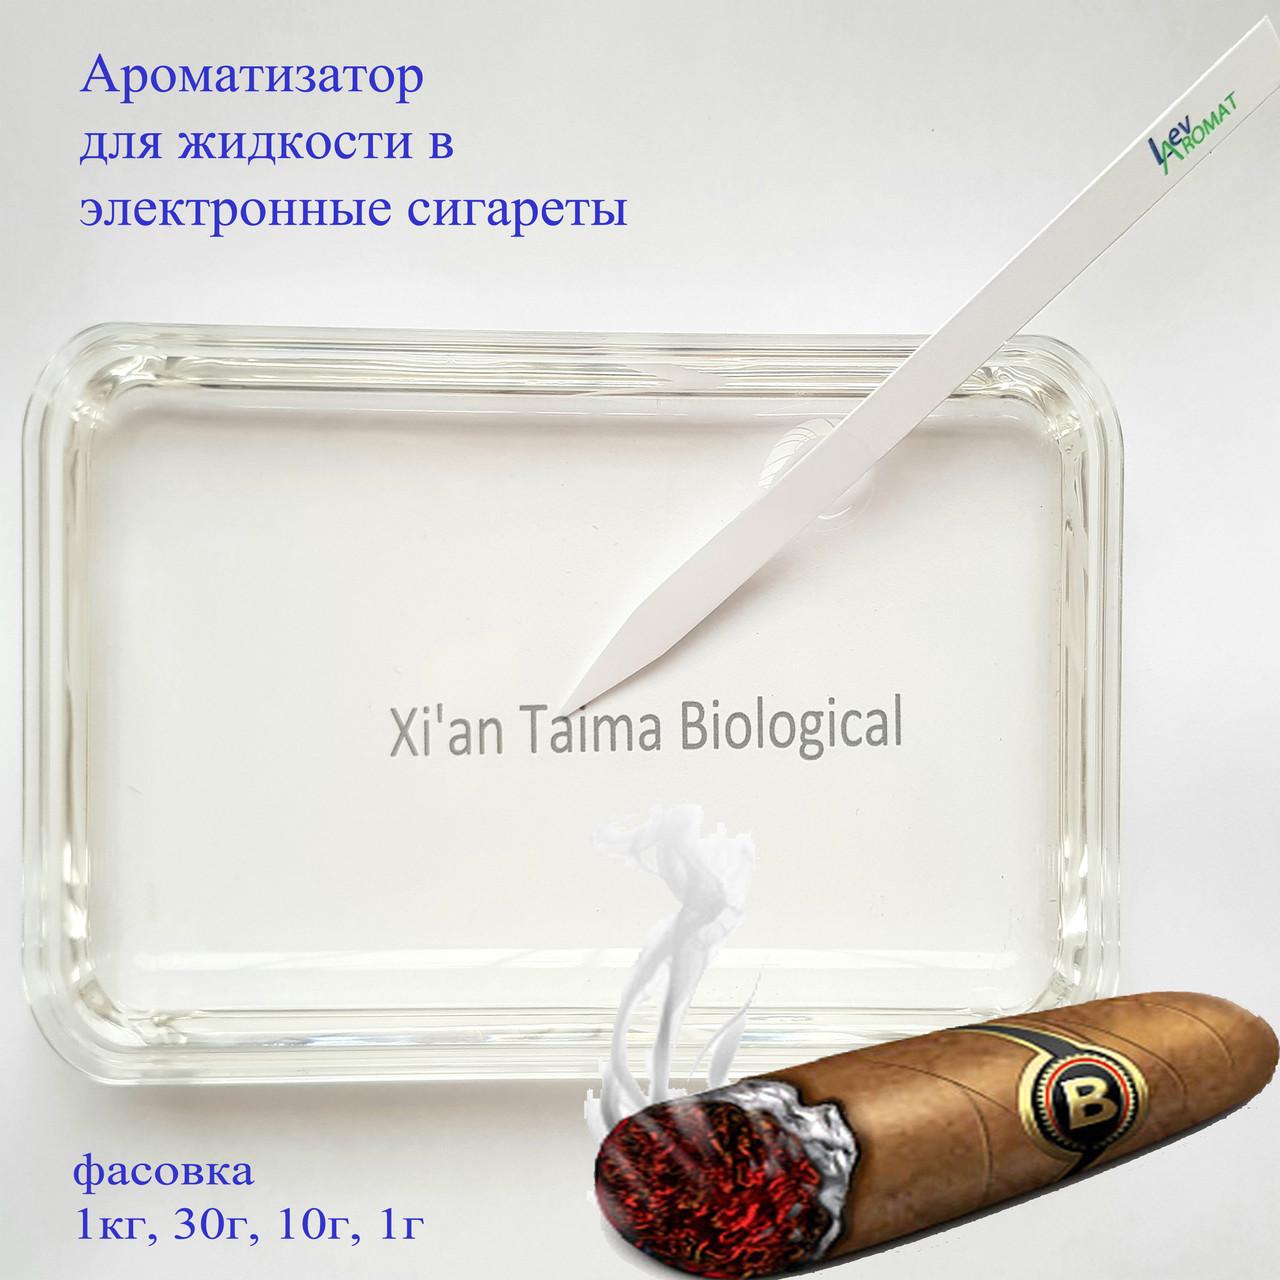 Ароматизатор Черри сигар (Cigar Cherry )  для электронных сигарет